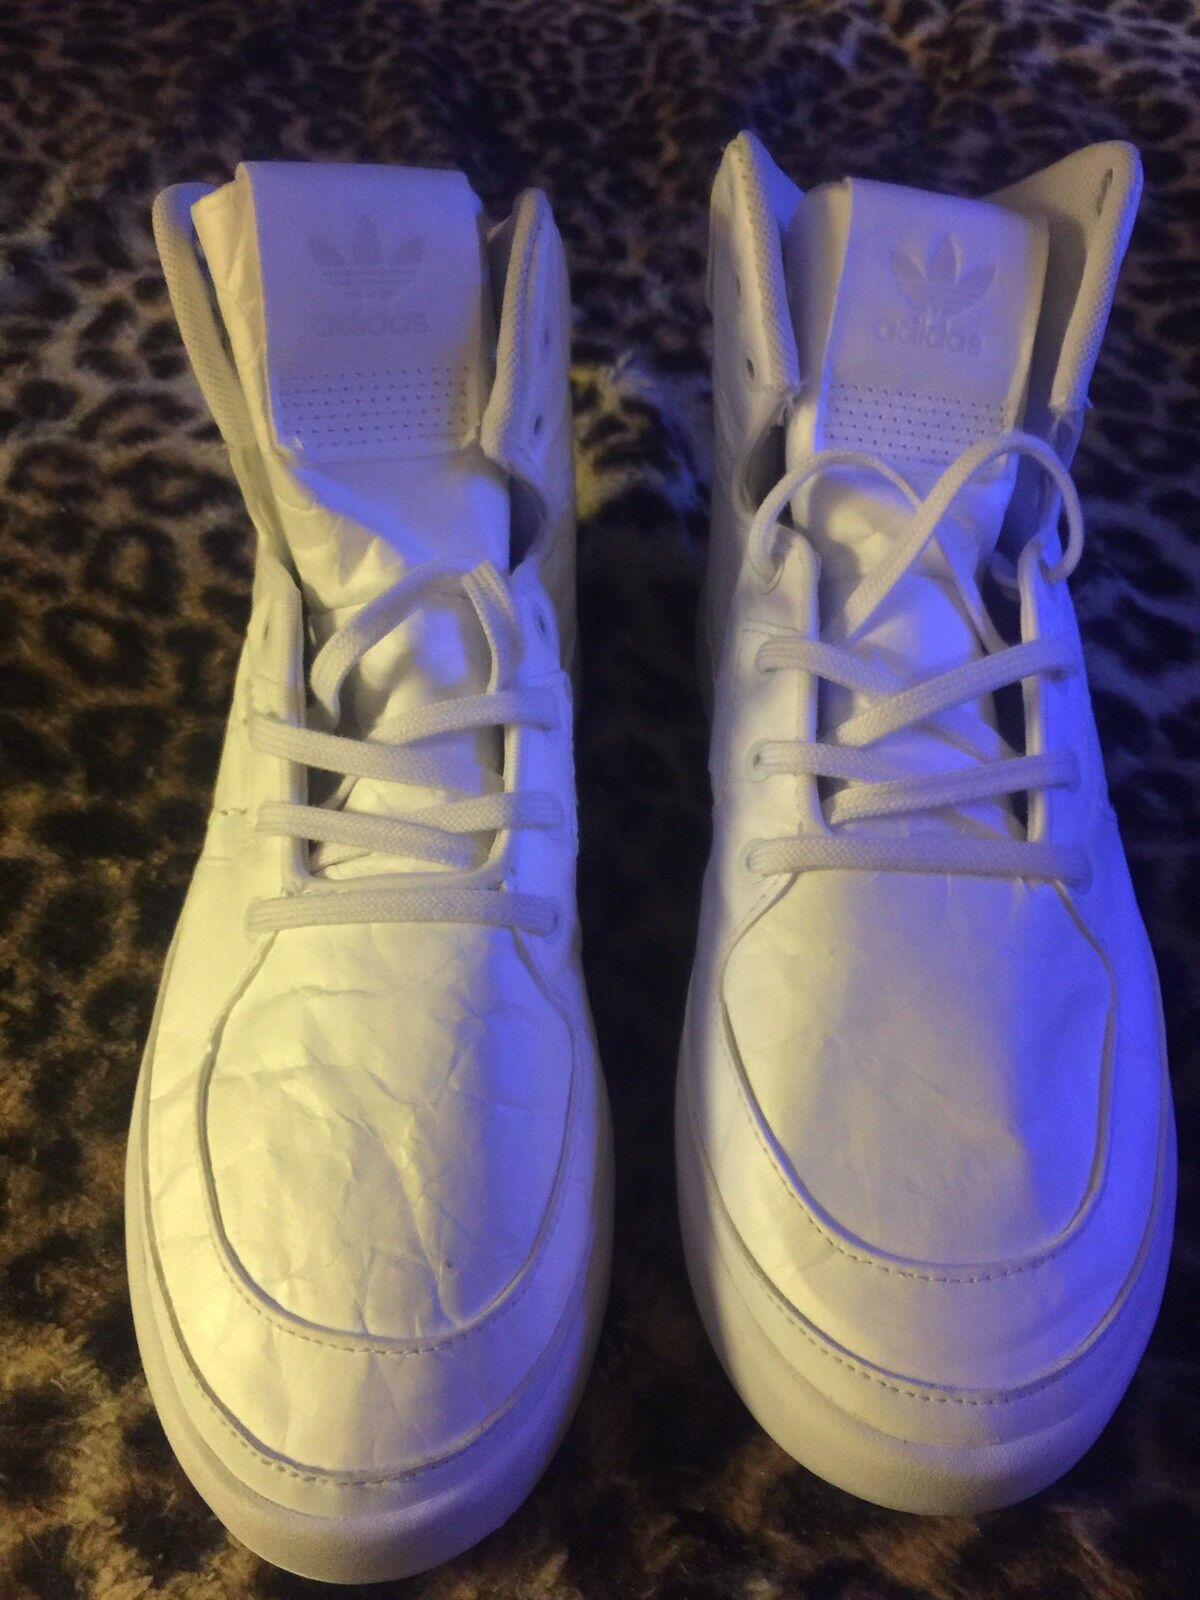 Adidas uomini scarpe nemeziz tango 18,3 indoor scarpe uomini arancione - da9621 ce5d21